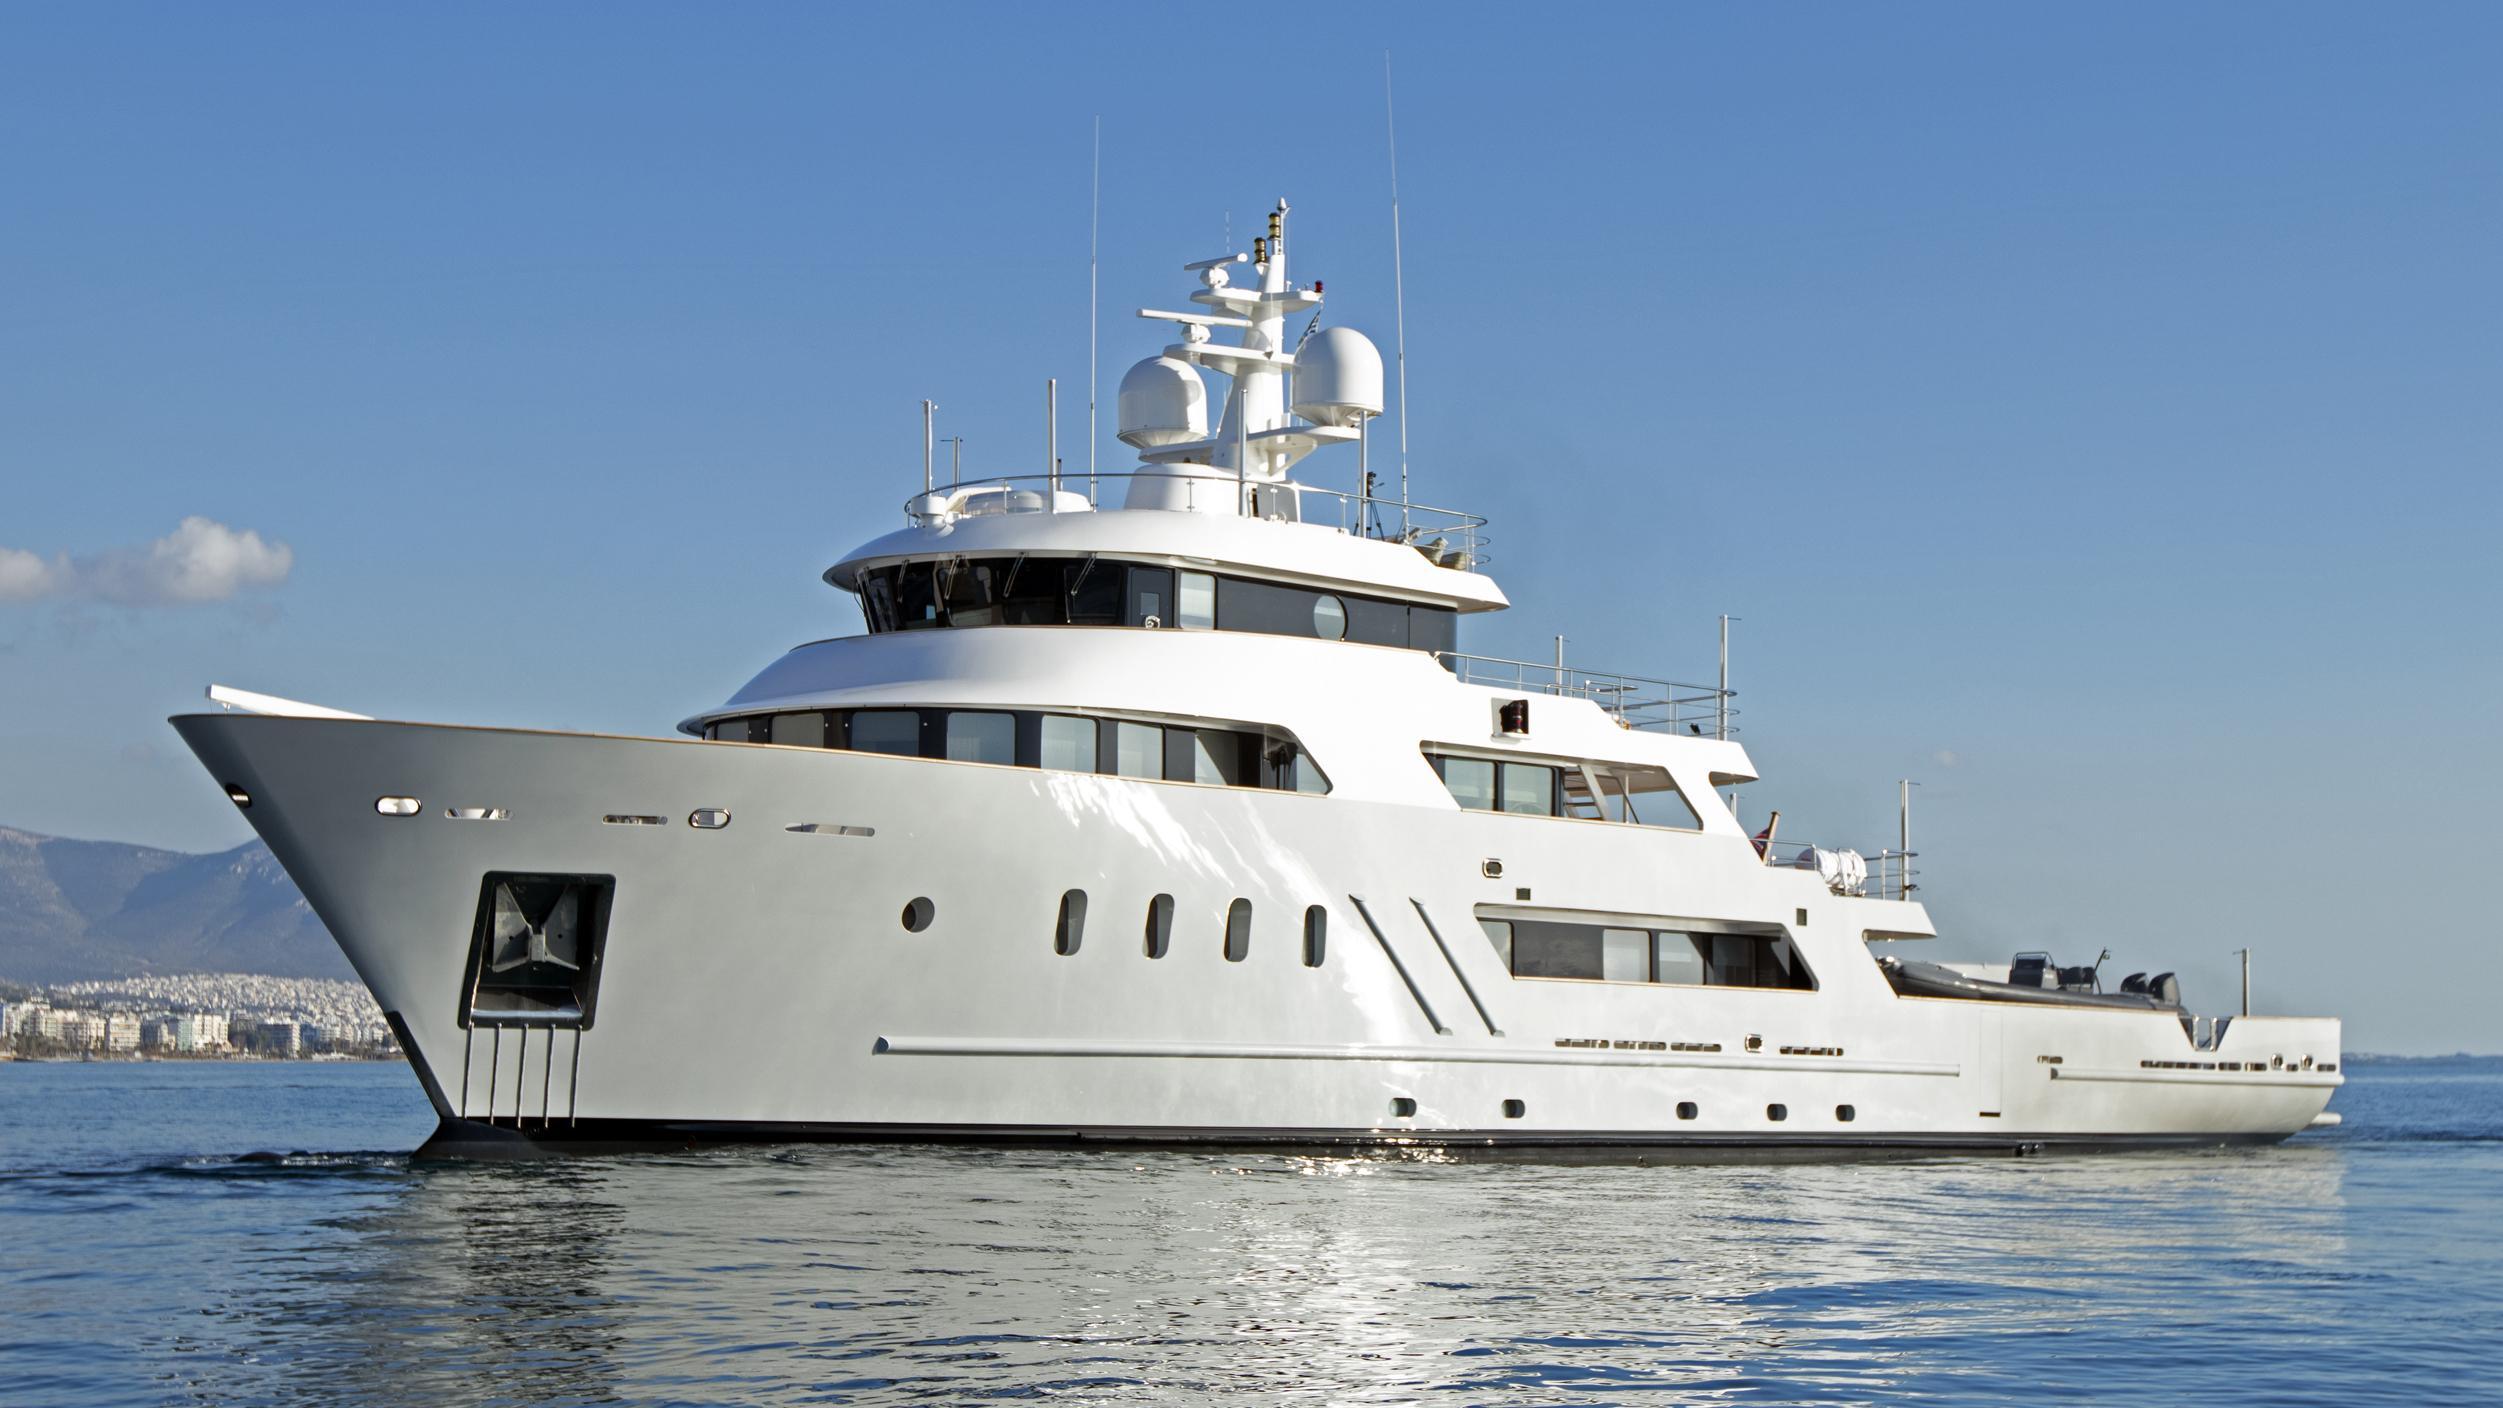 aspire explorer yacht penglai bohai lusben 2006 51m cruising after 2019 refit